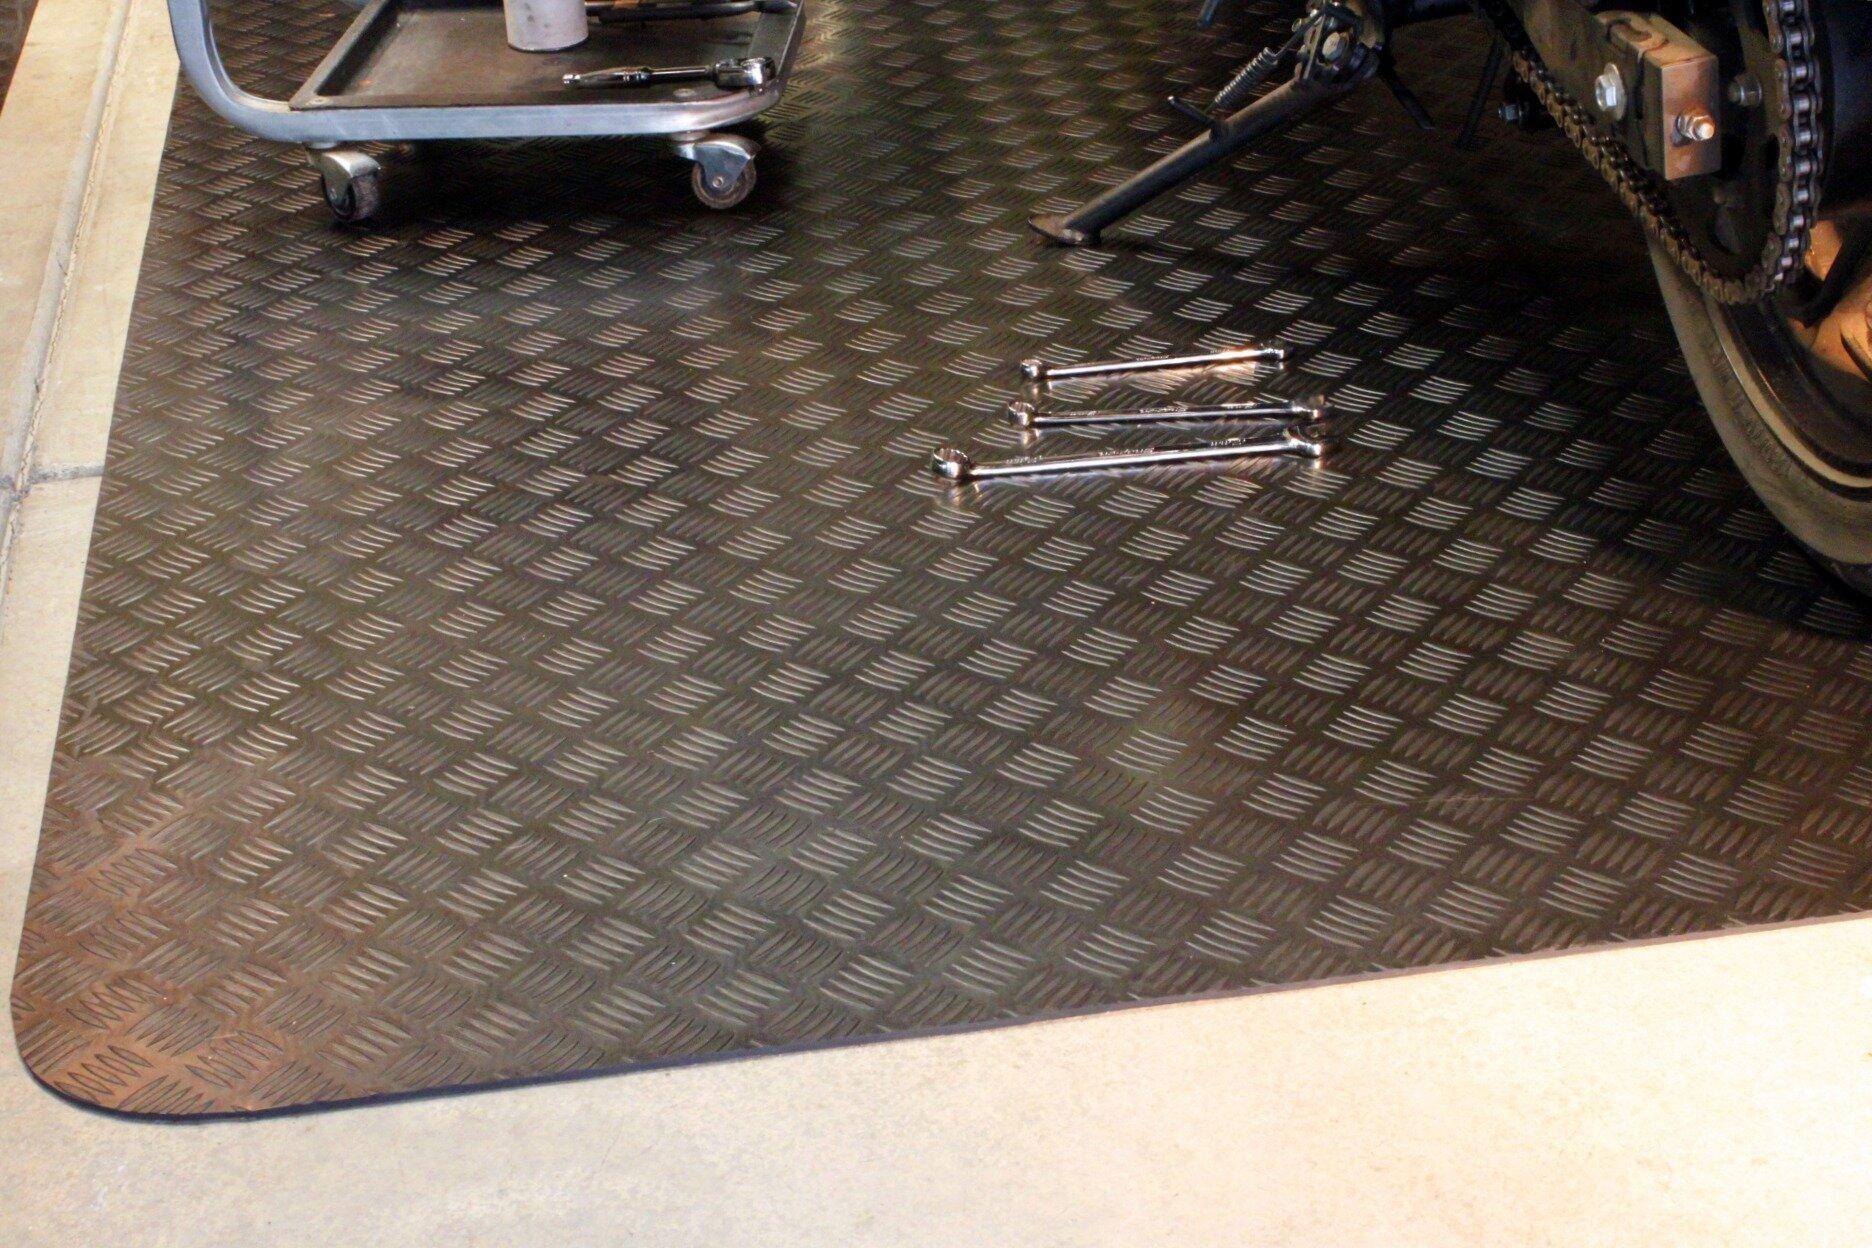 Mats inc autoguard garage floor protection utility mat for Auto flooring